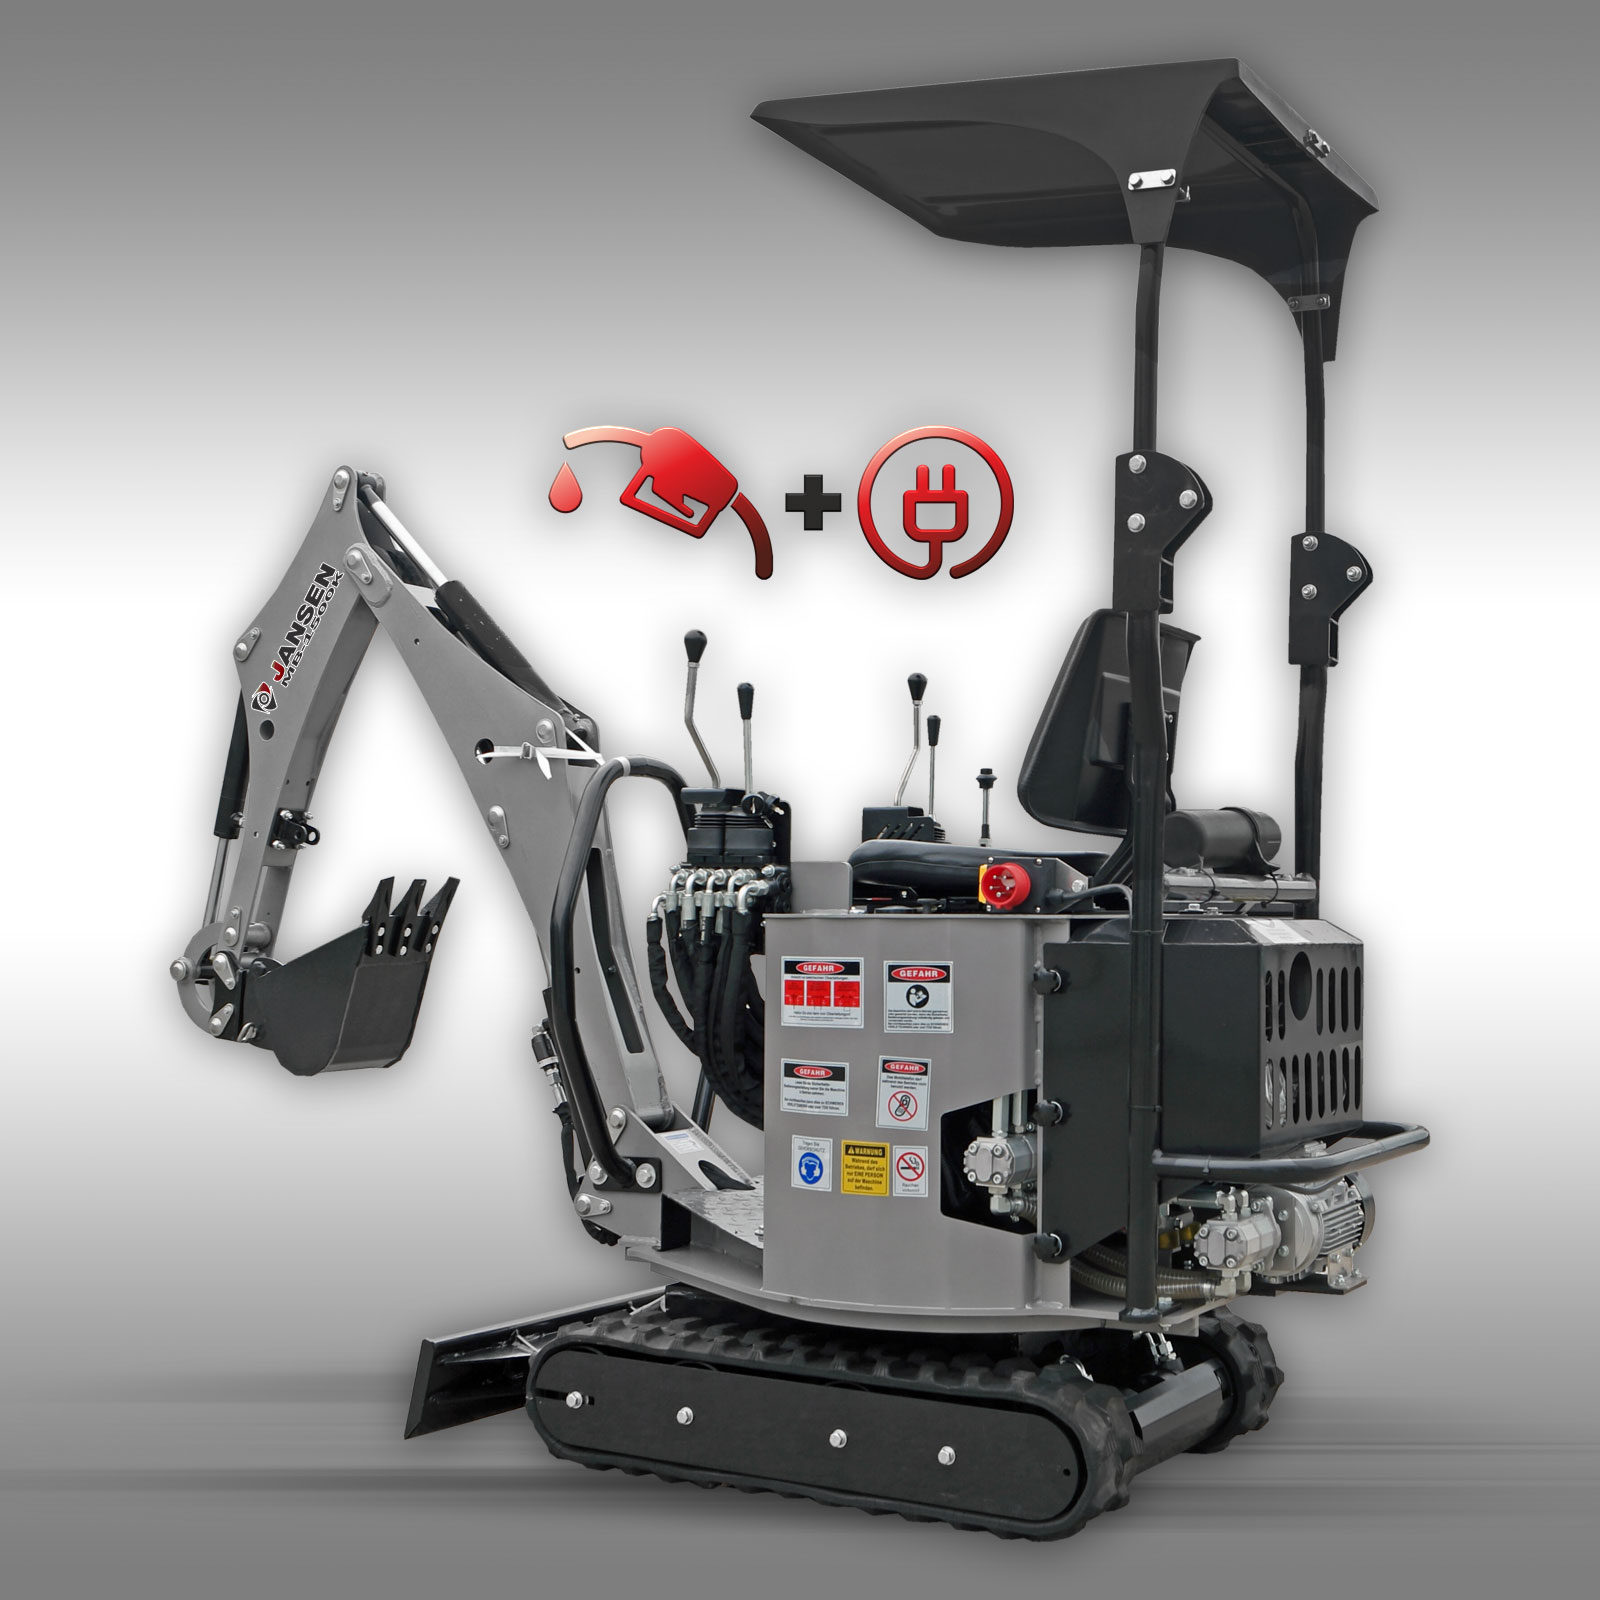 Jansen Minigraafmachine  MB-1500K, benzinemotor + elektromotor